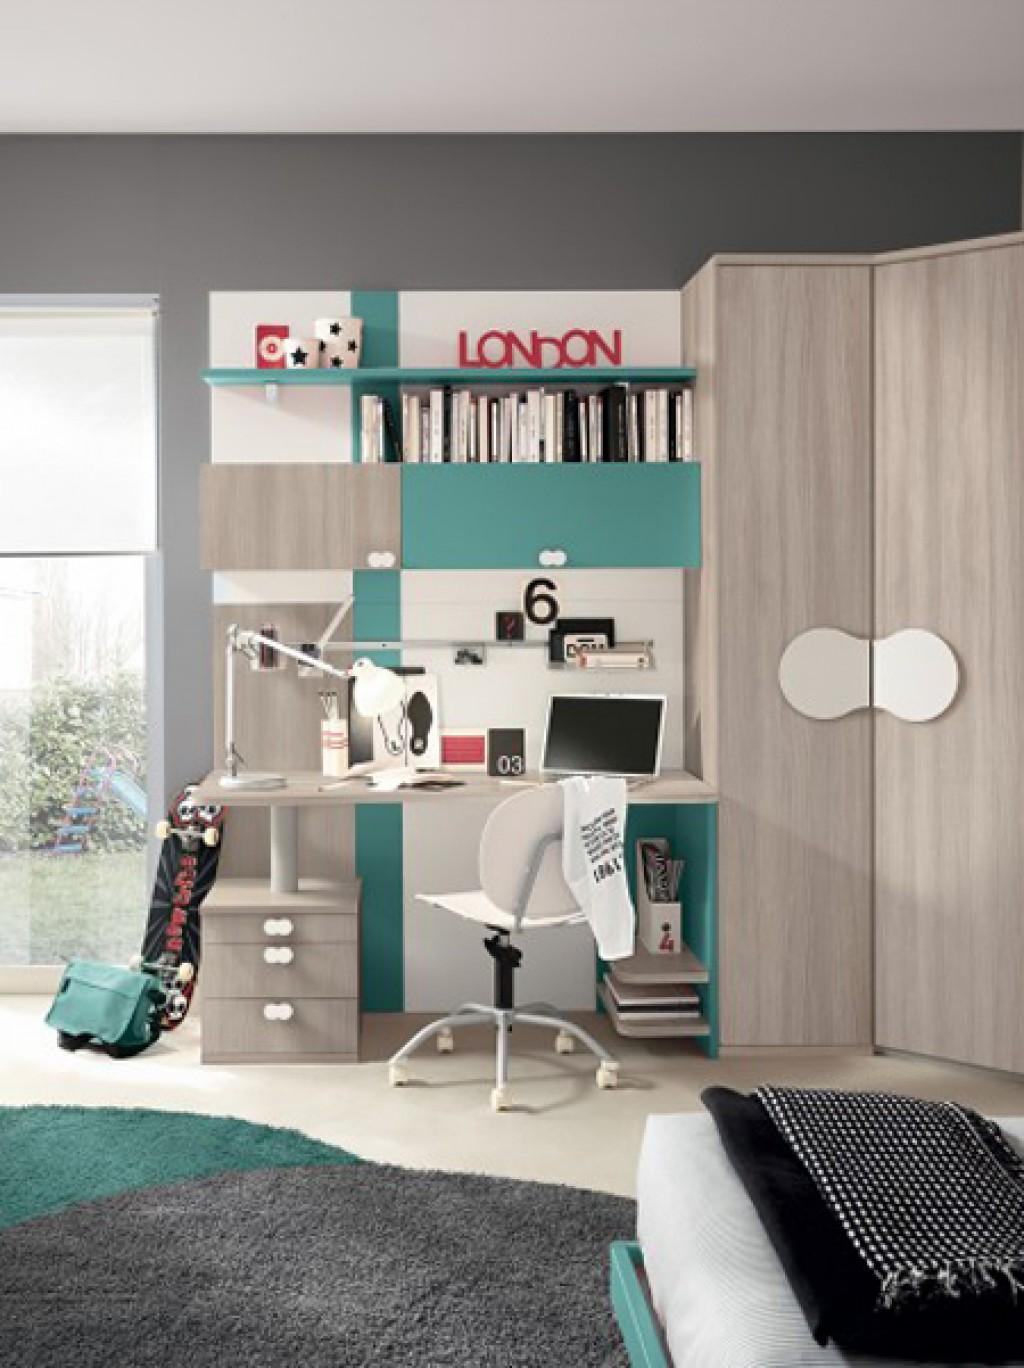 Cameretta moderna oc g c117 cucine mobili di qualit for Crea la tua cameretta